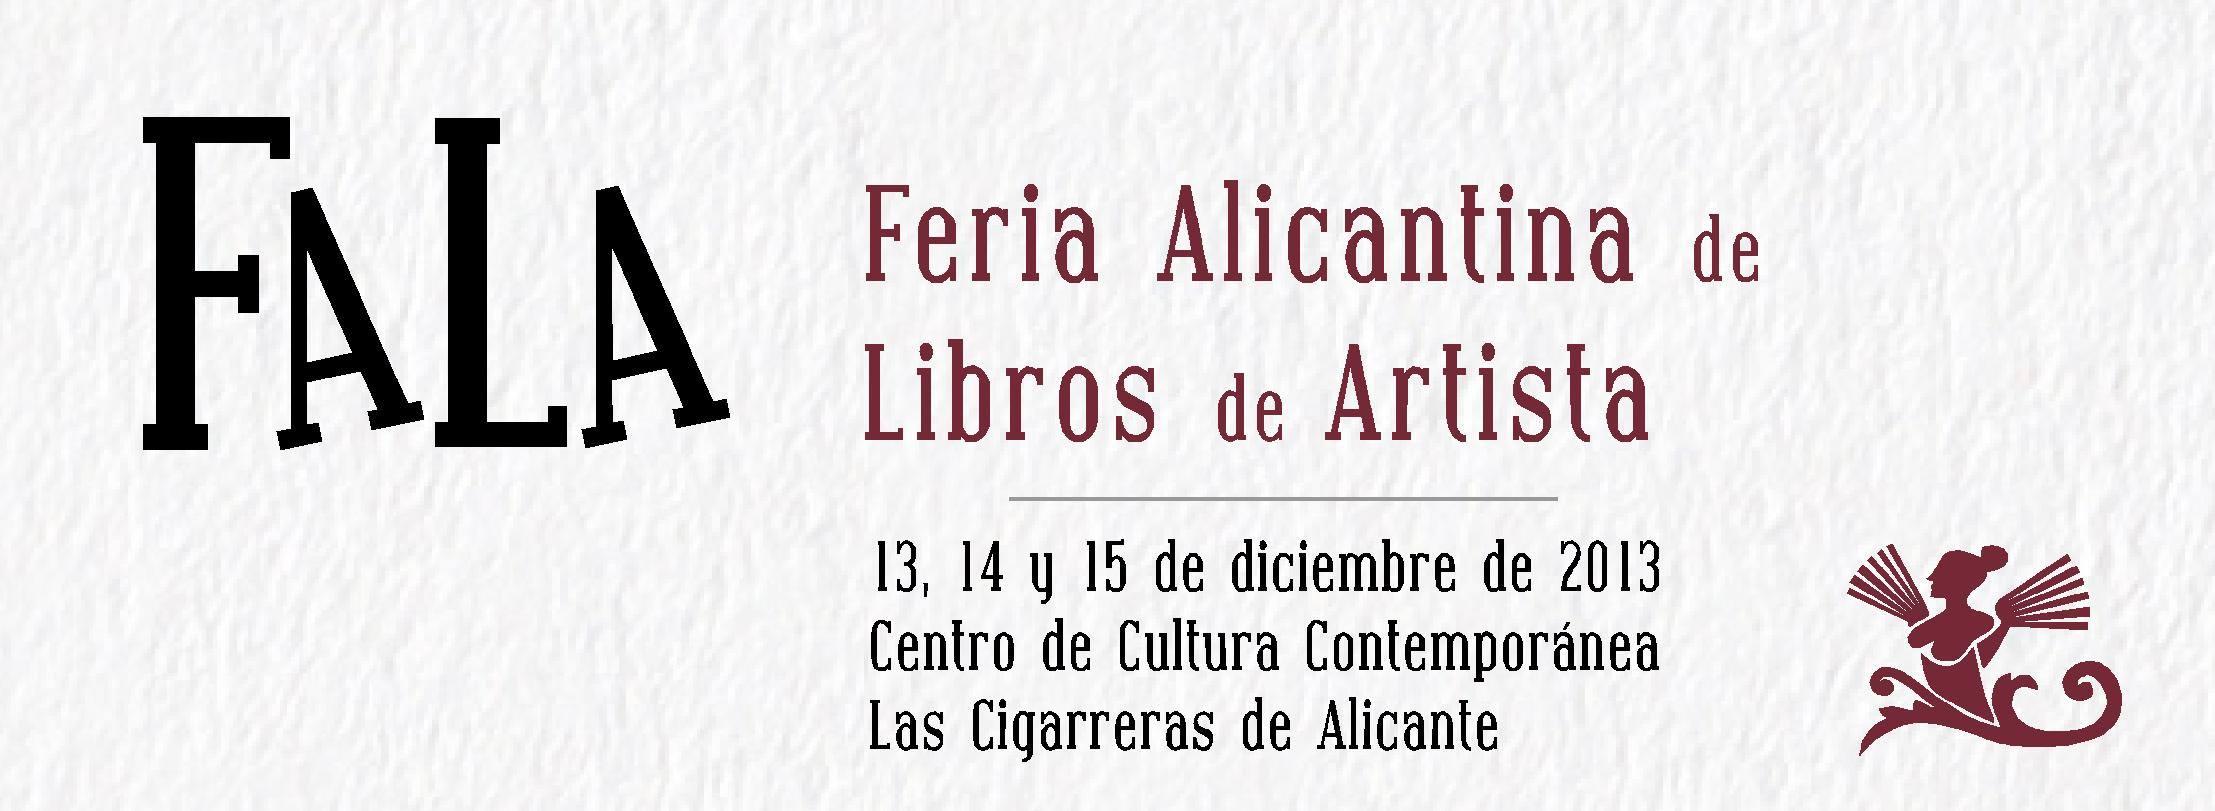 Feria Alicantina de Libros de Artista